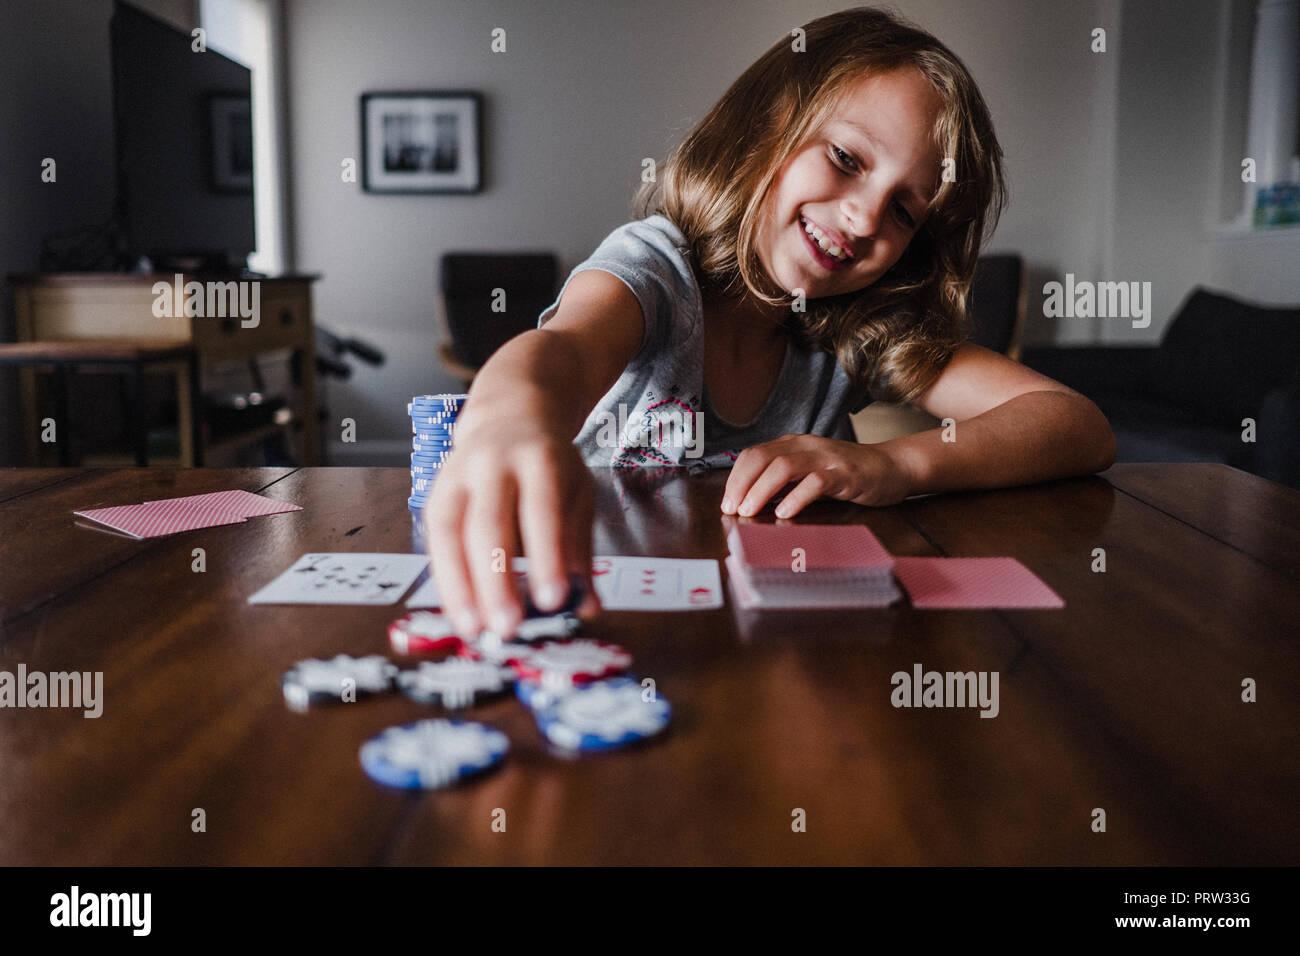 Girl playing cards at table, placing gambling chips - Stock Image